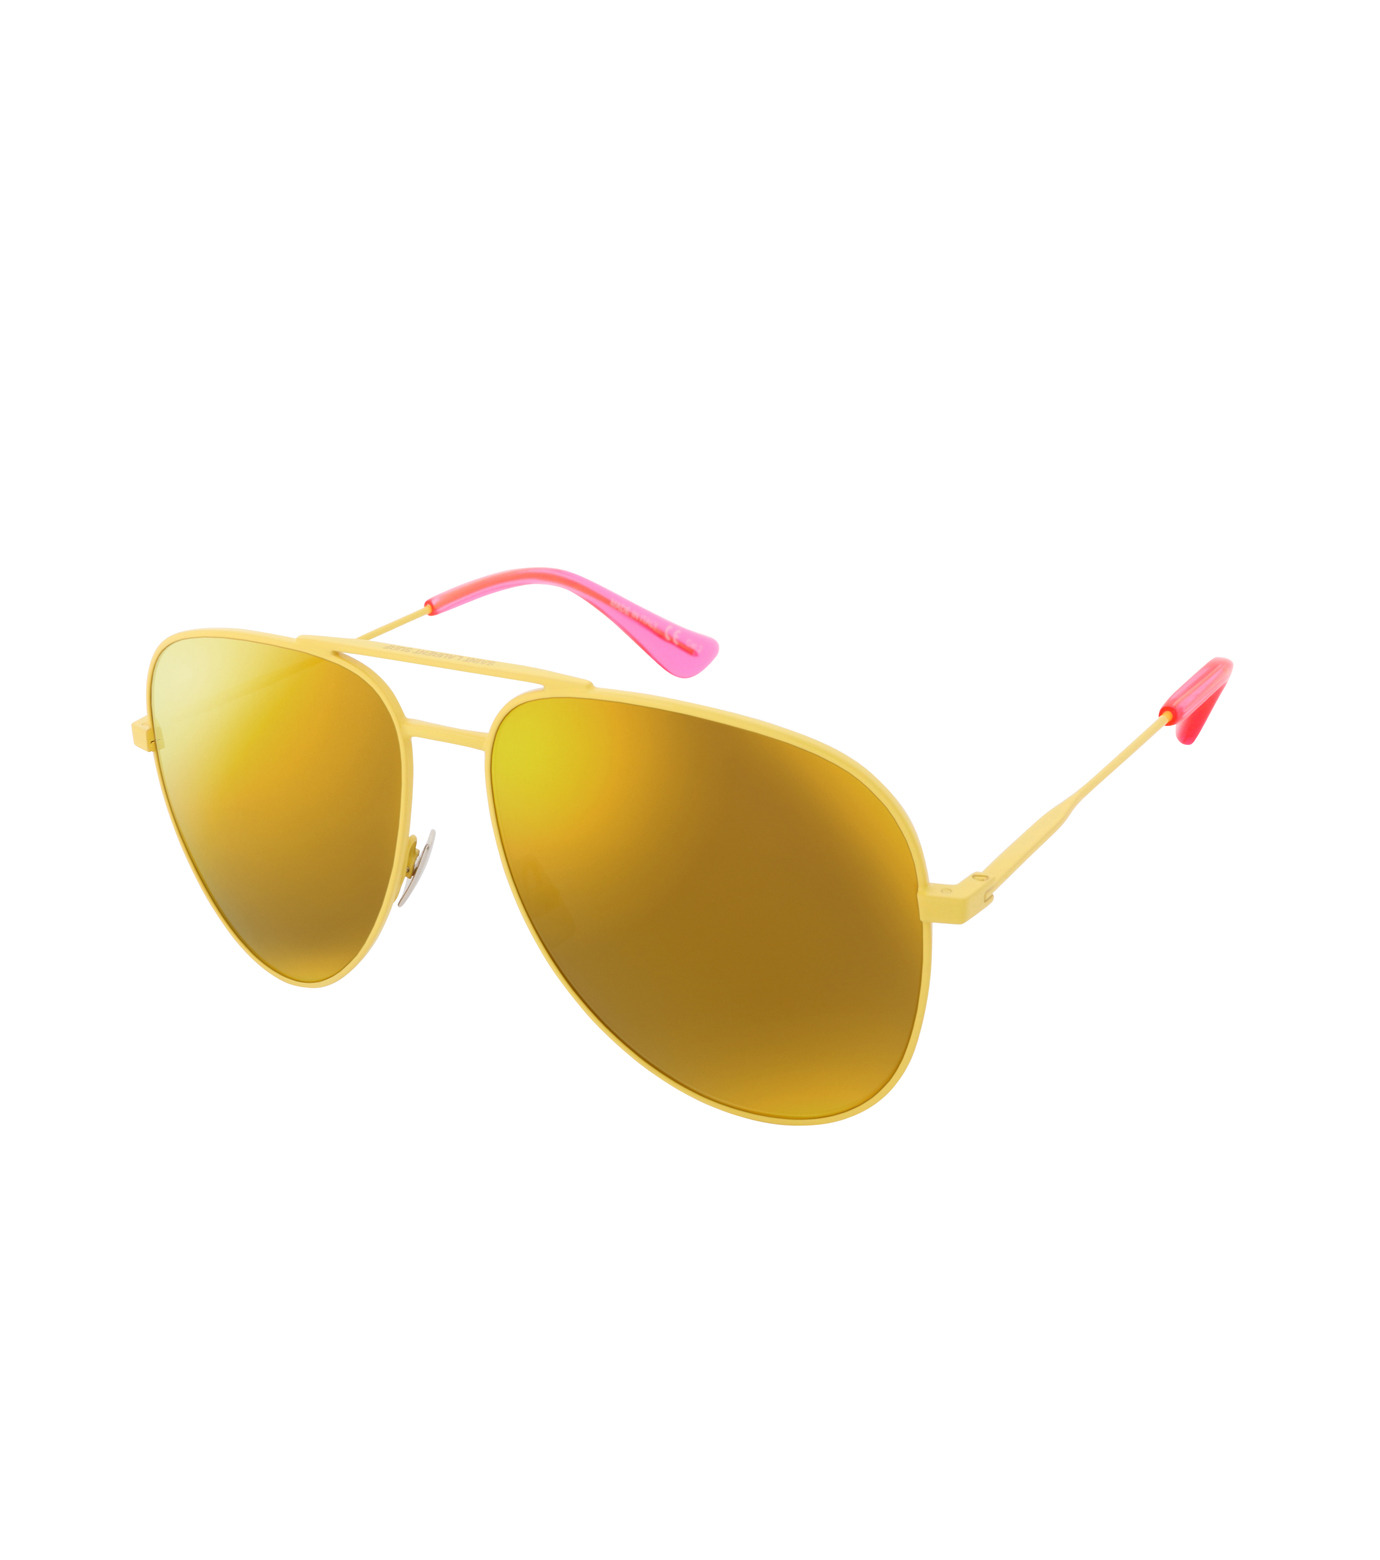 SAINT LAURENT(サンローラン)のTeardrop-YELLOW(アイウェア/eyewear)-427758-Y9902-32 拡大詳細画像1